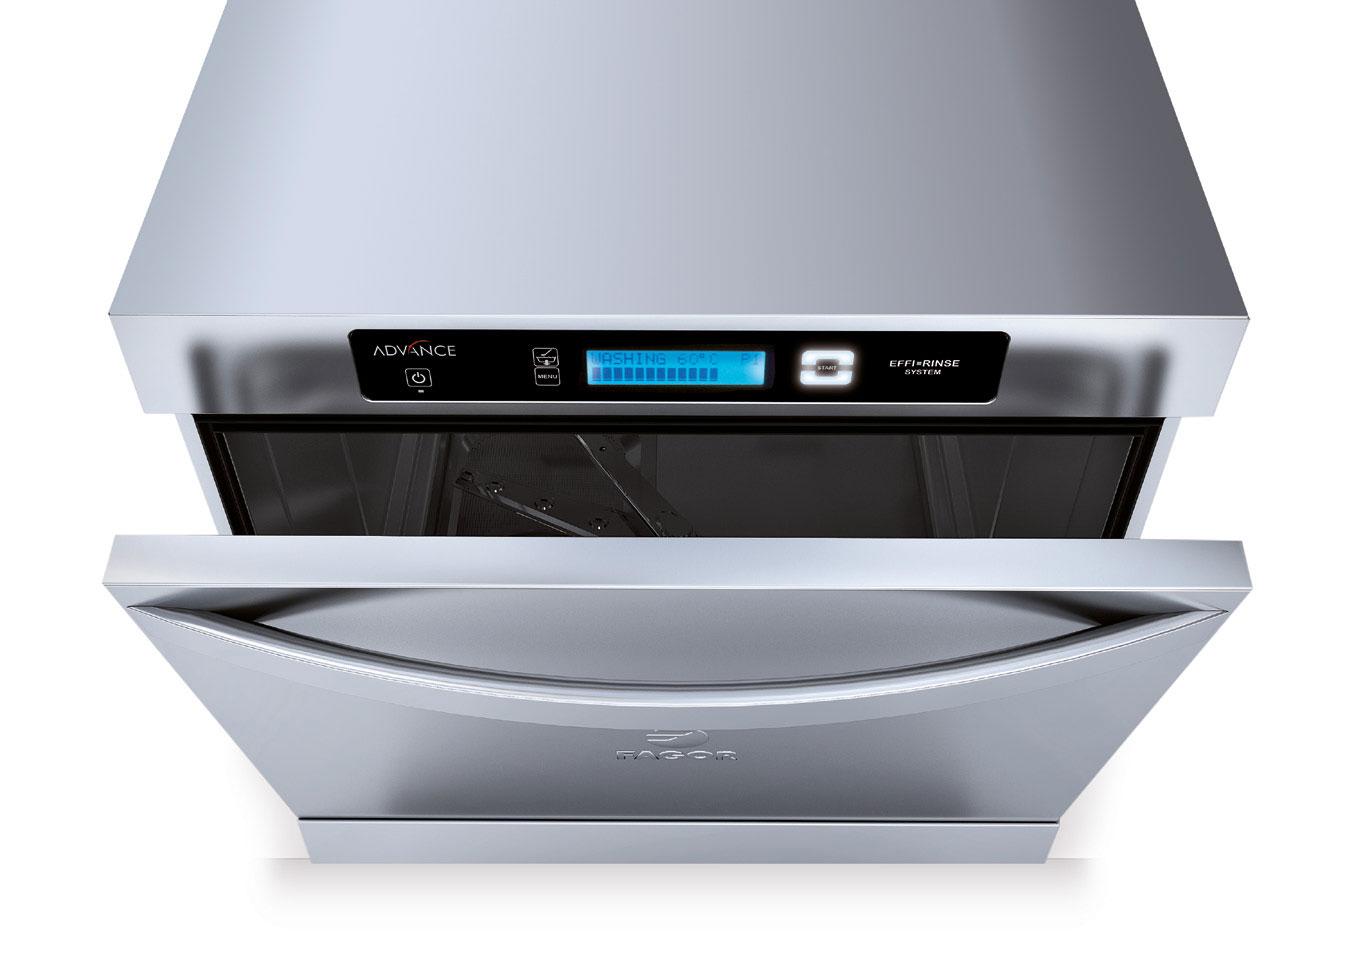 EVO-advance-dishwasher